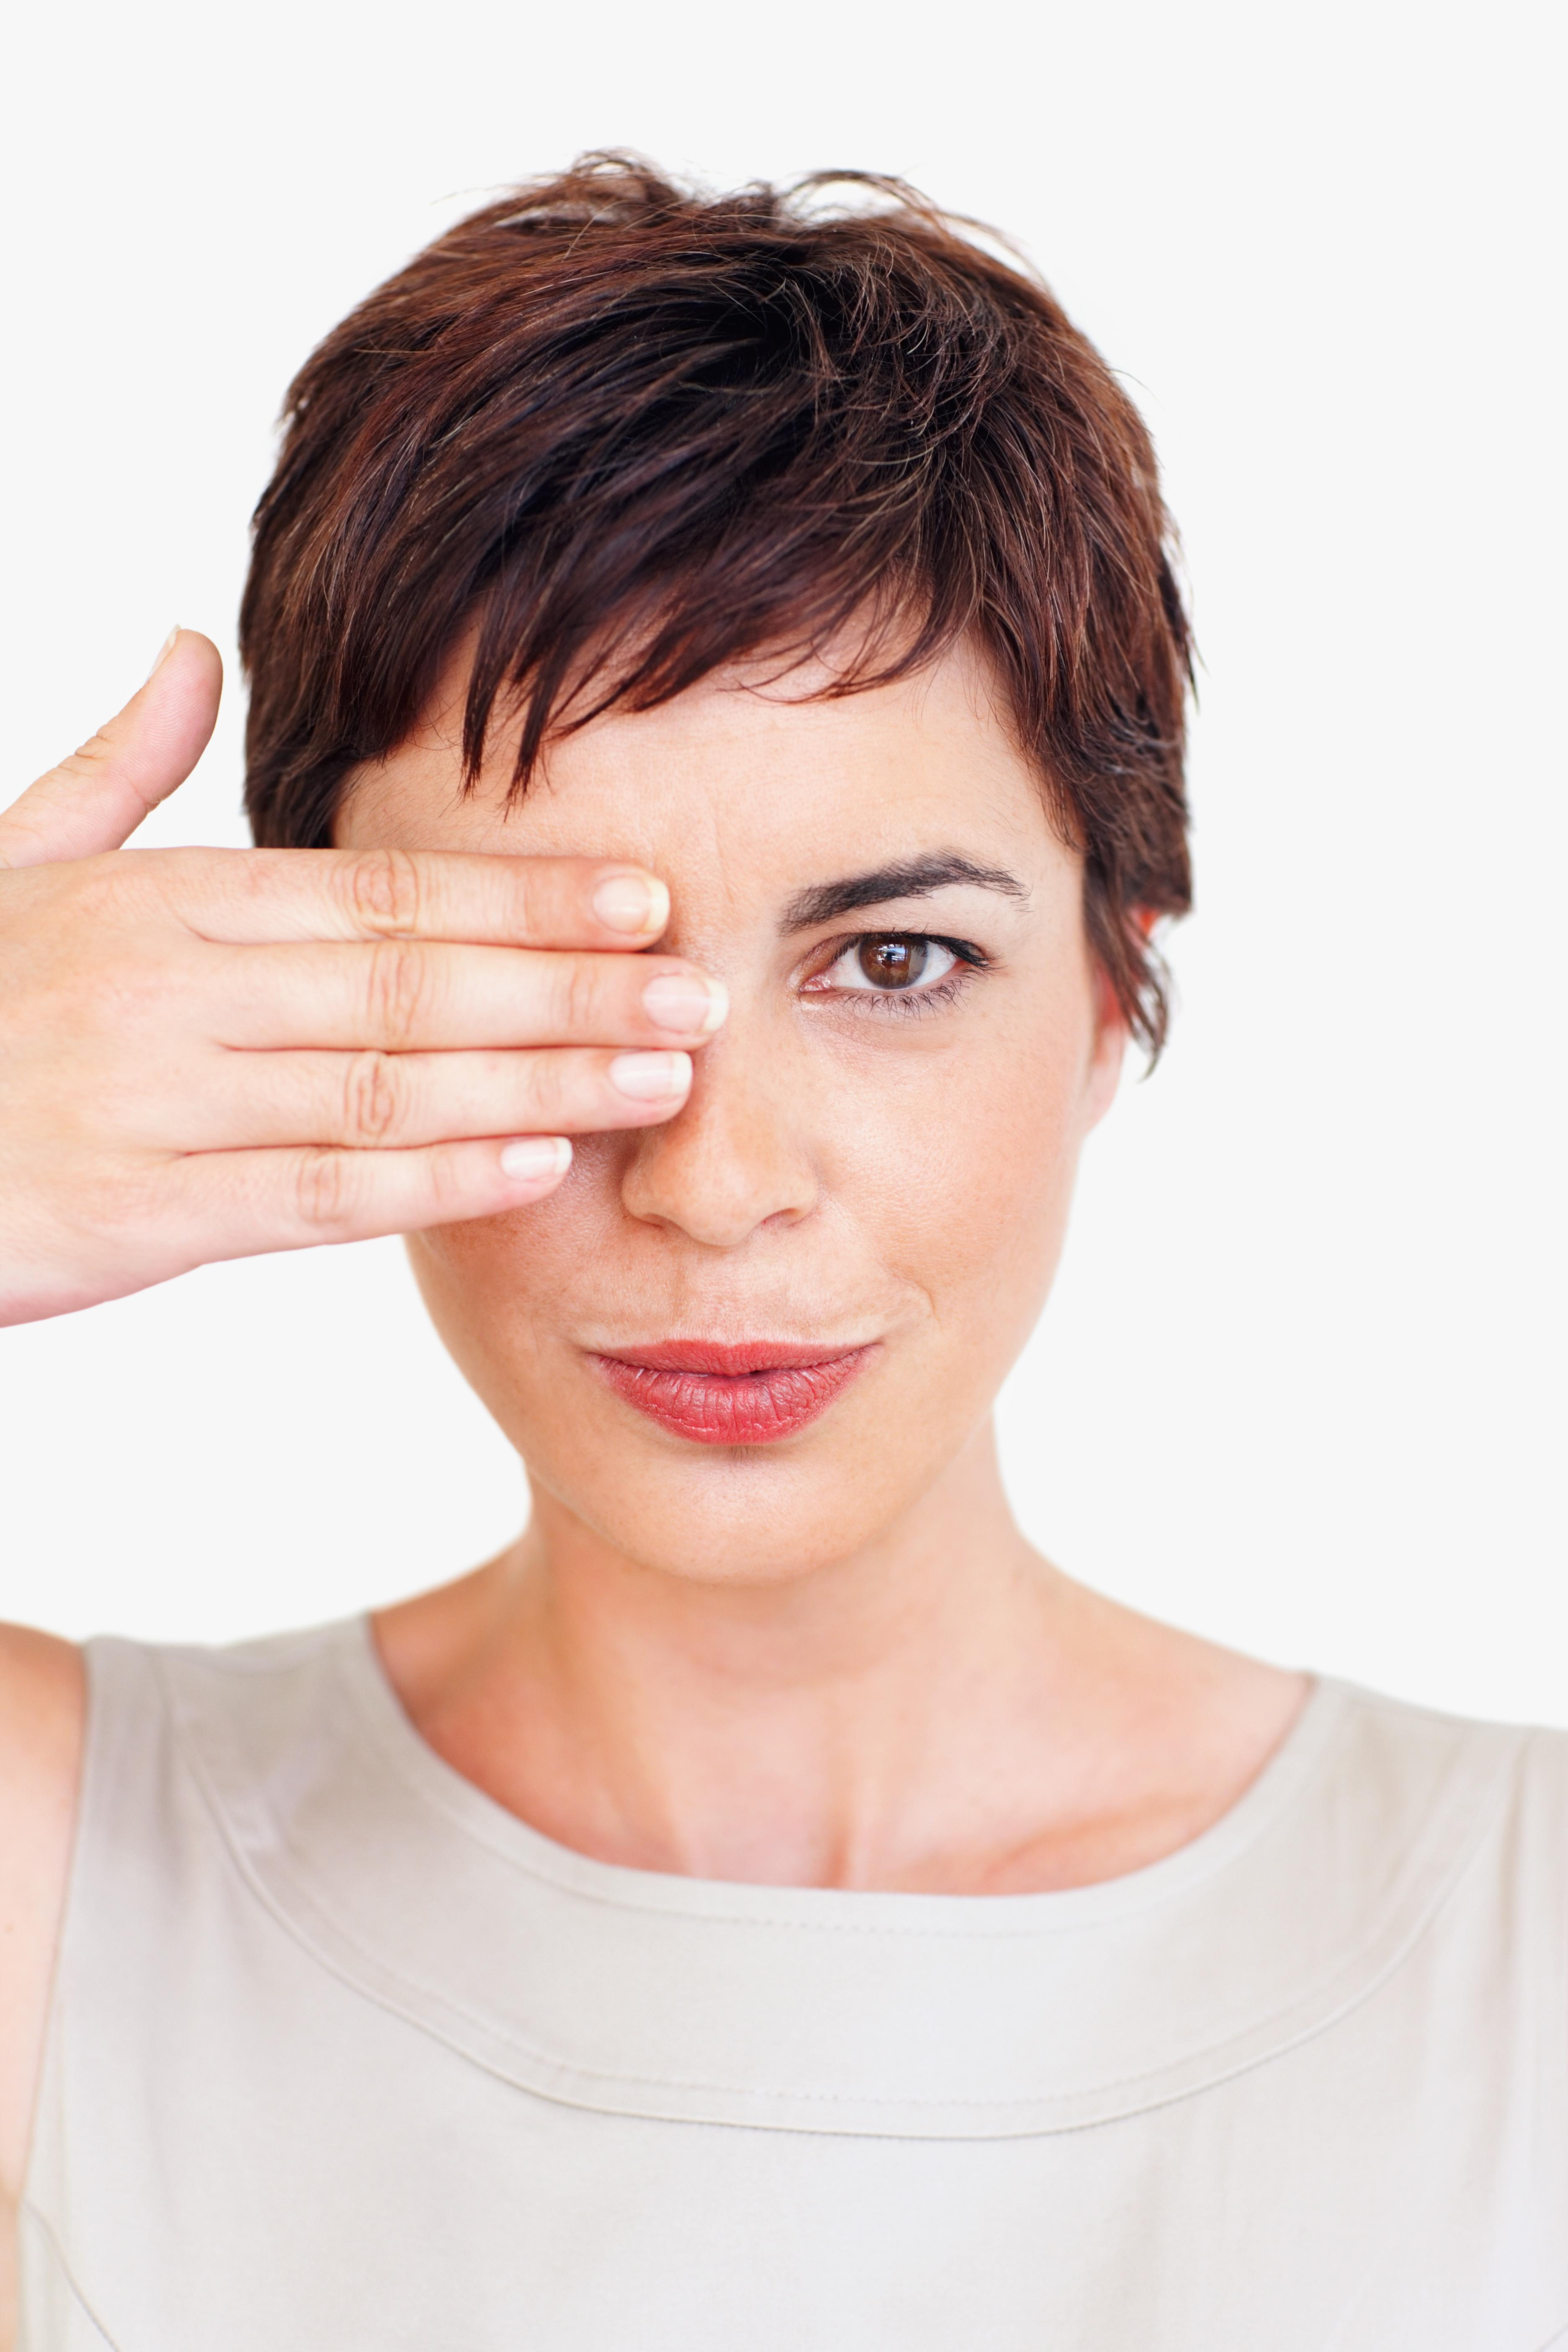 Mujer con camiseta beige tapándose un ojo